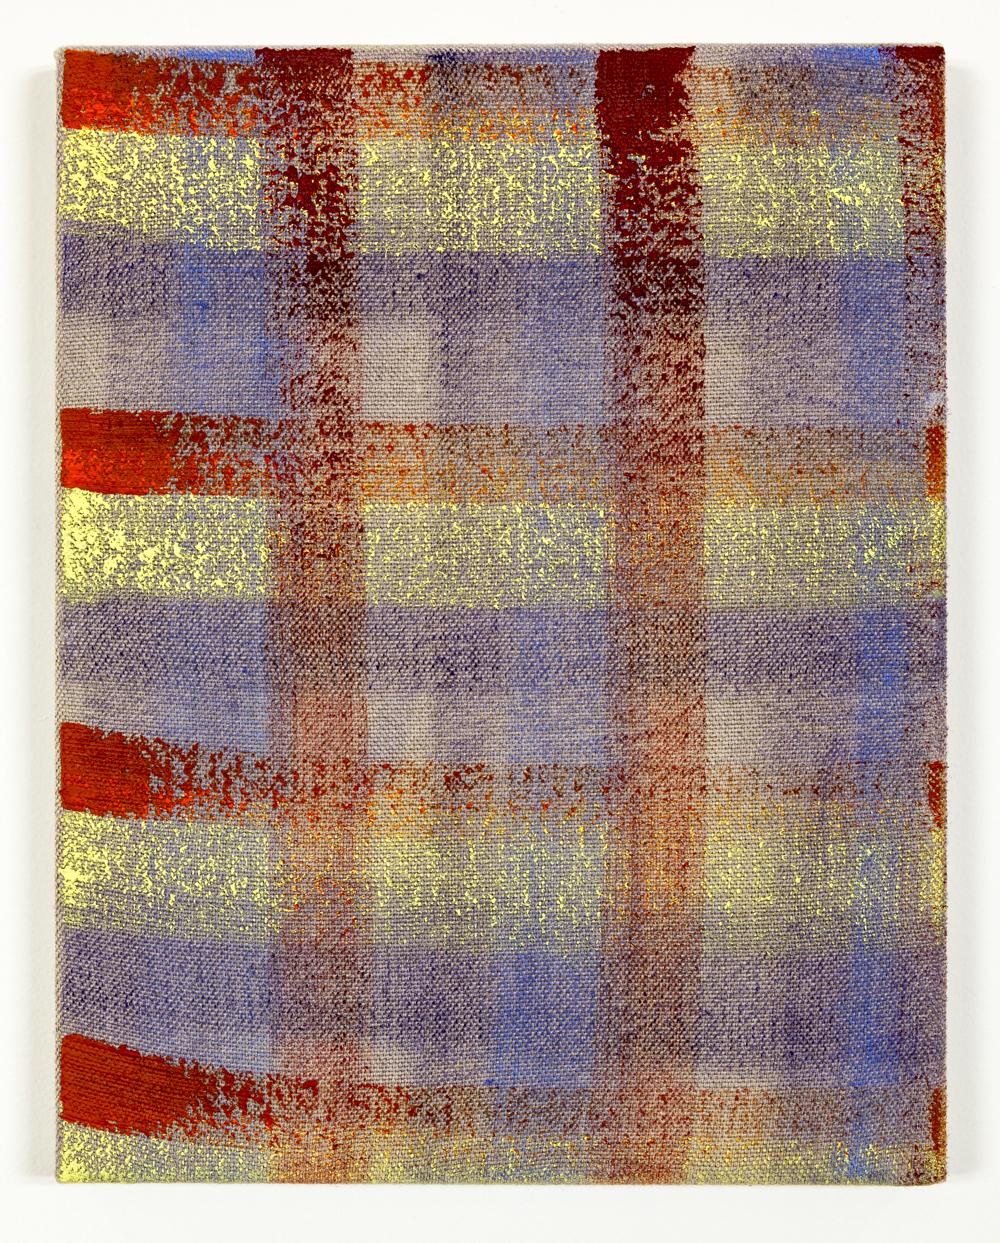 "Untitled, Oil on unprimed linen, 14""x11"", 2015"